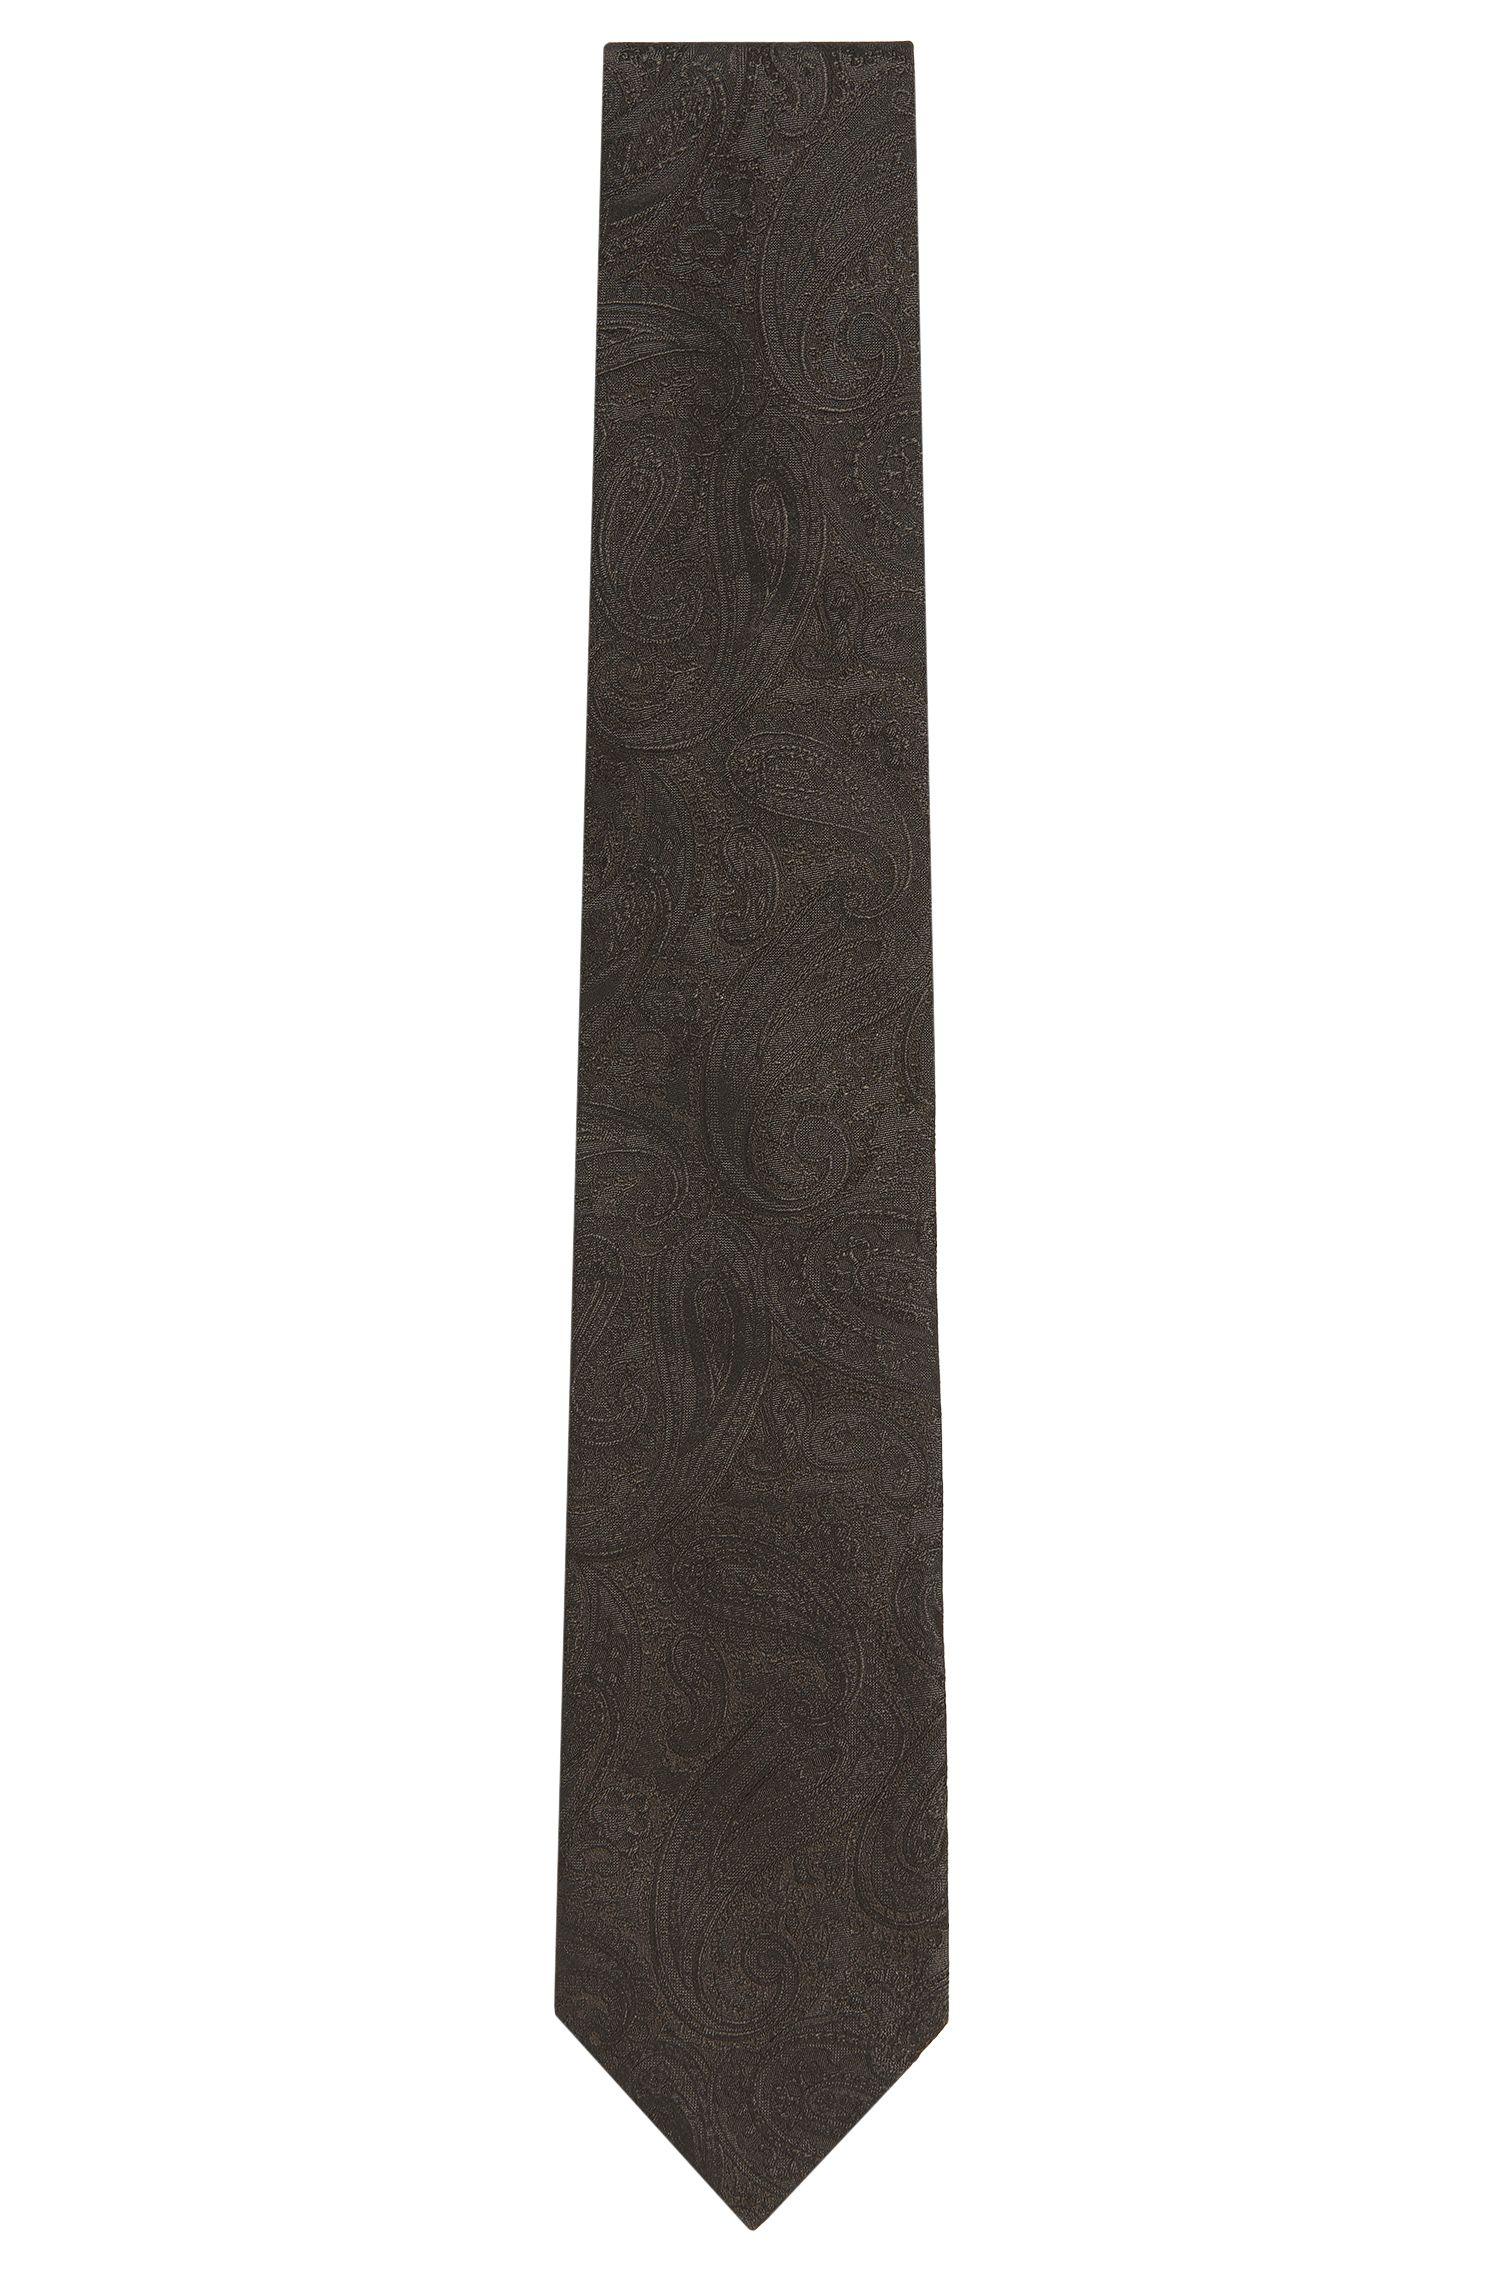 Cravatta in seta con motivo Paisley: 'Tie cm 7'